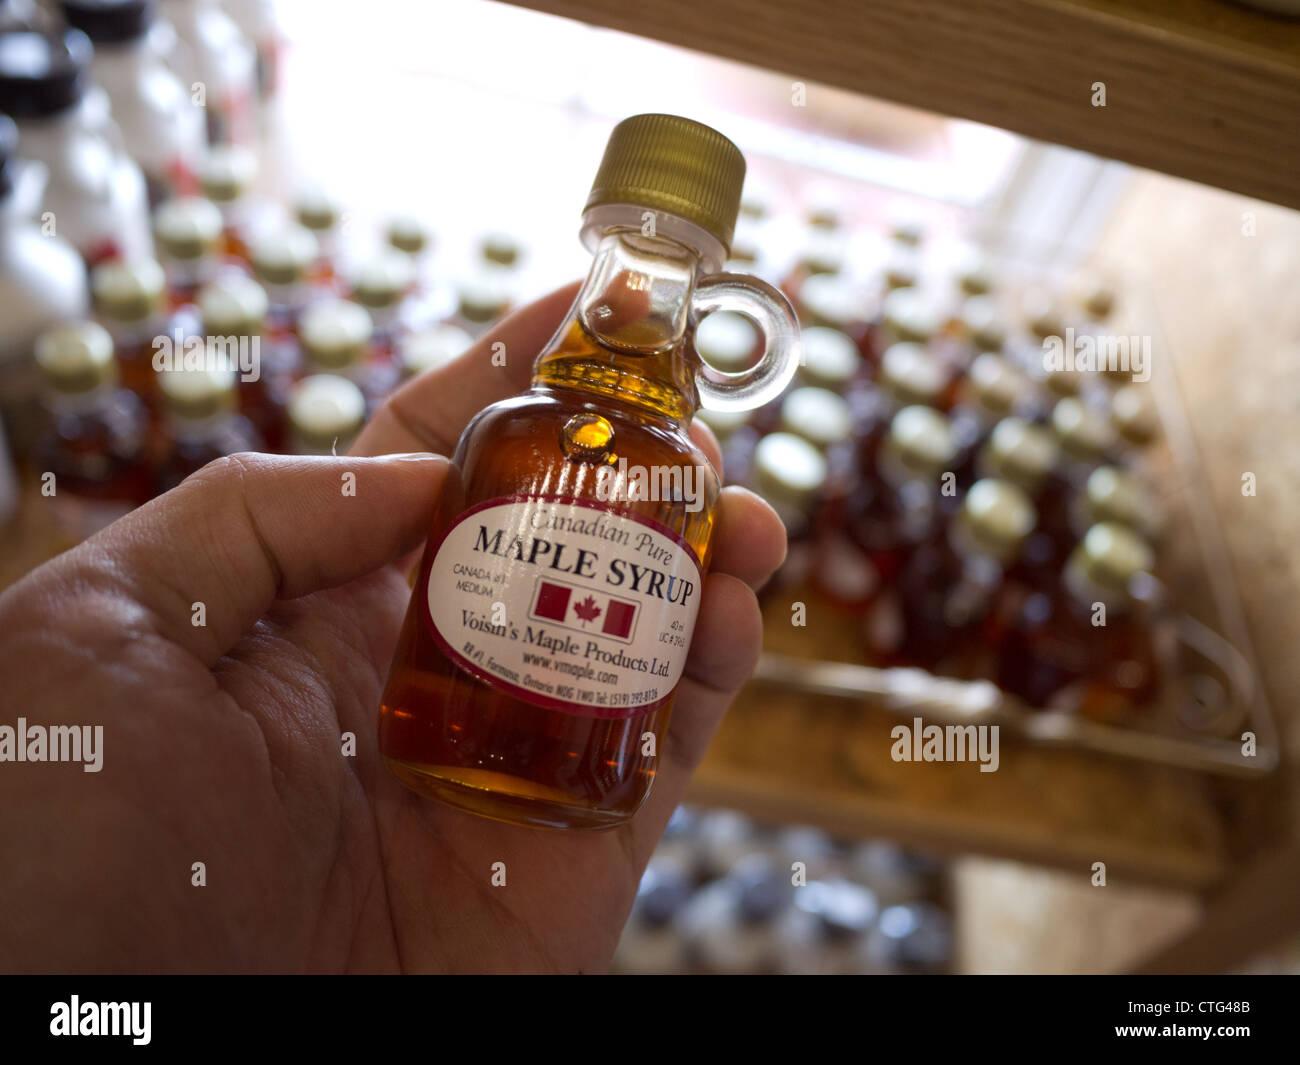 maple syrup bottle hand holding canada - Stock Image